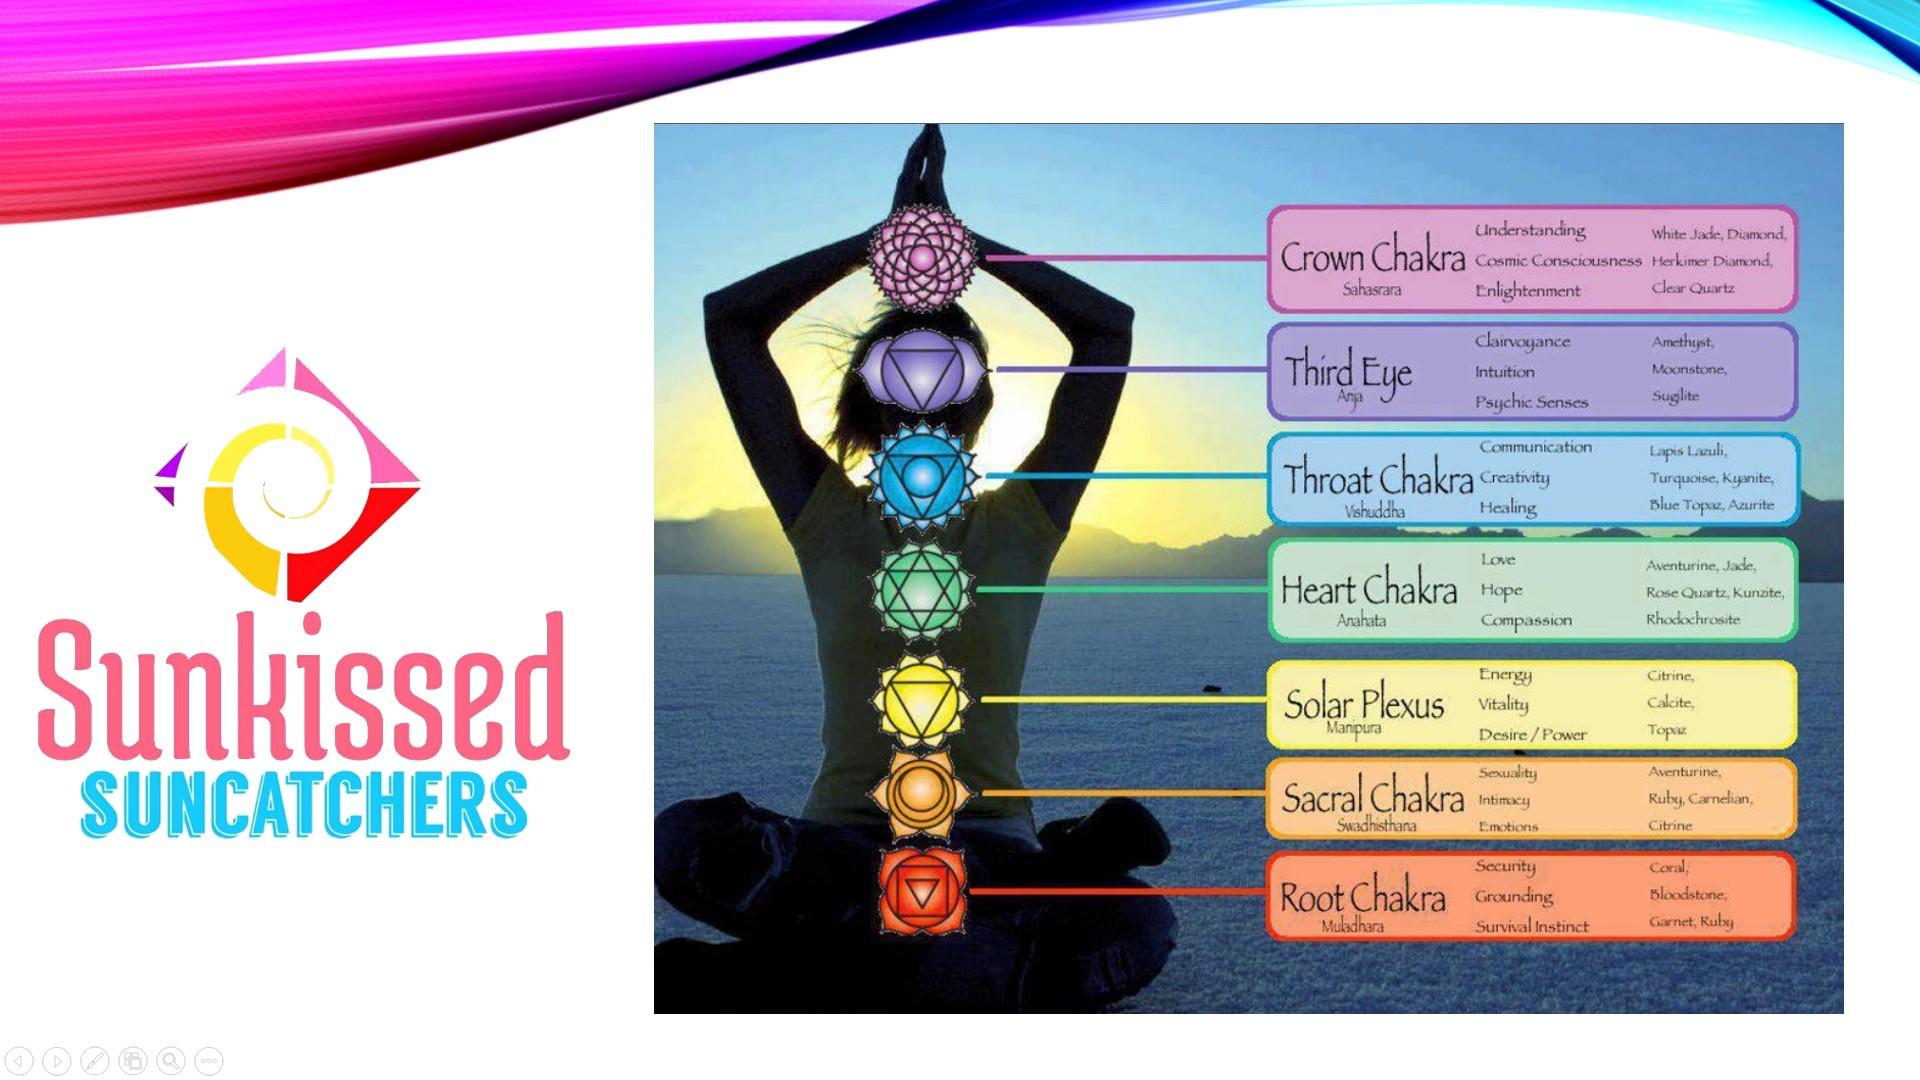 Sunkissed Suncatchers 11 Chakras